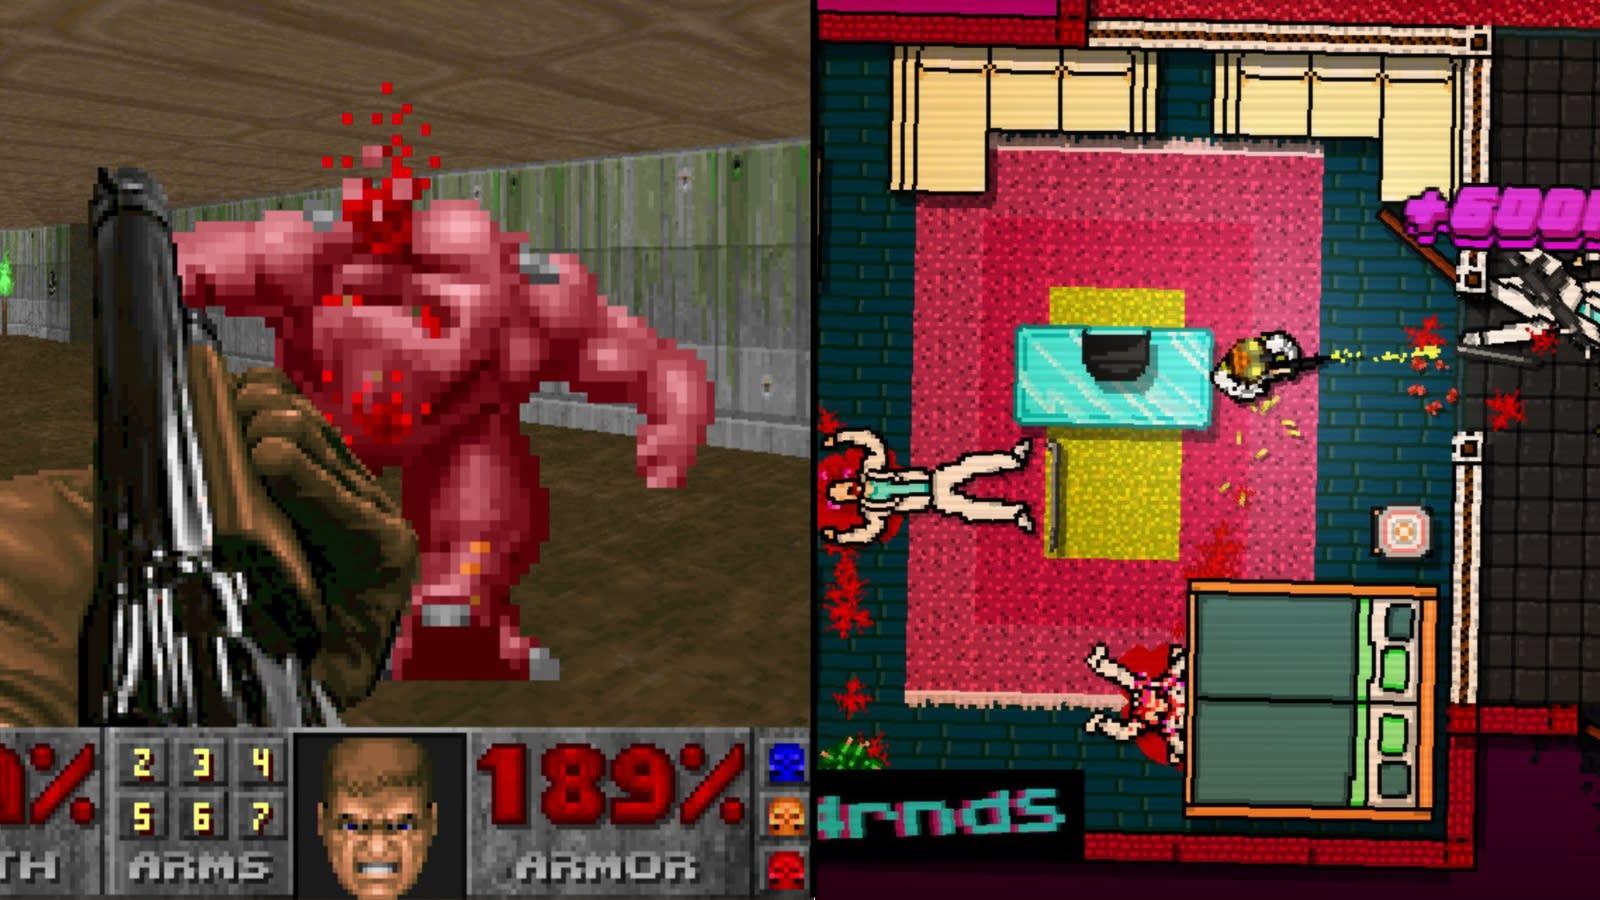 Doom (left) and Hotline Miami 2 (right).